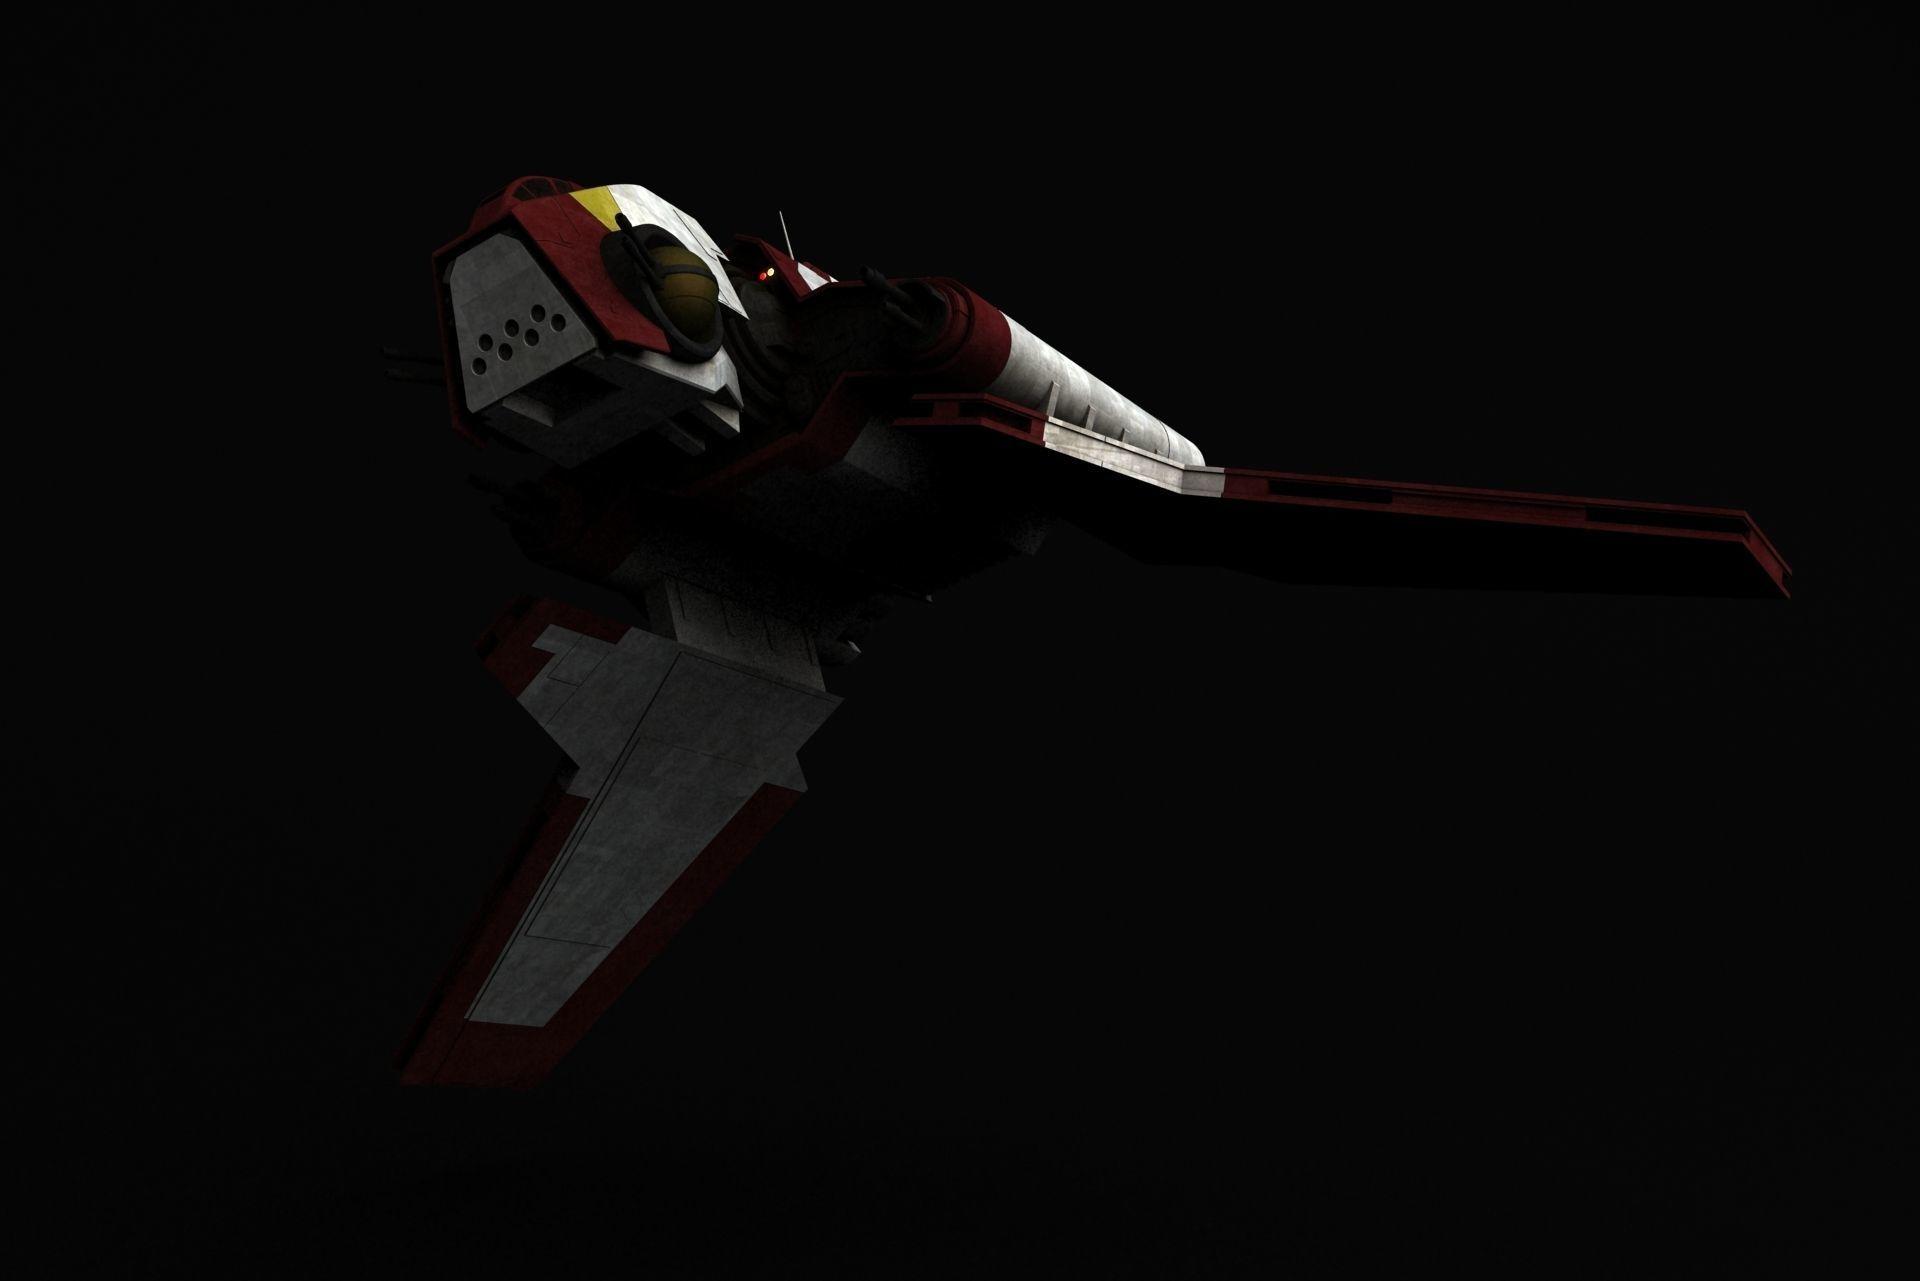 Star Wars Nu-class attack shuttle